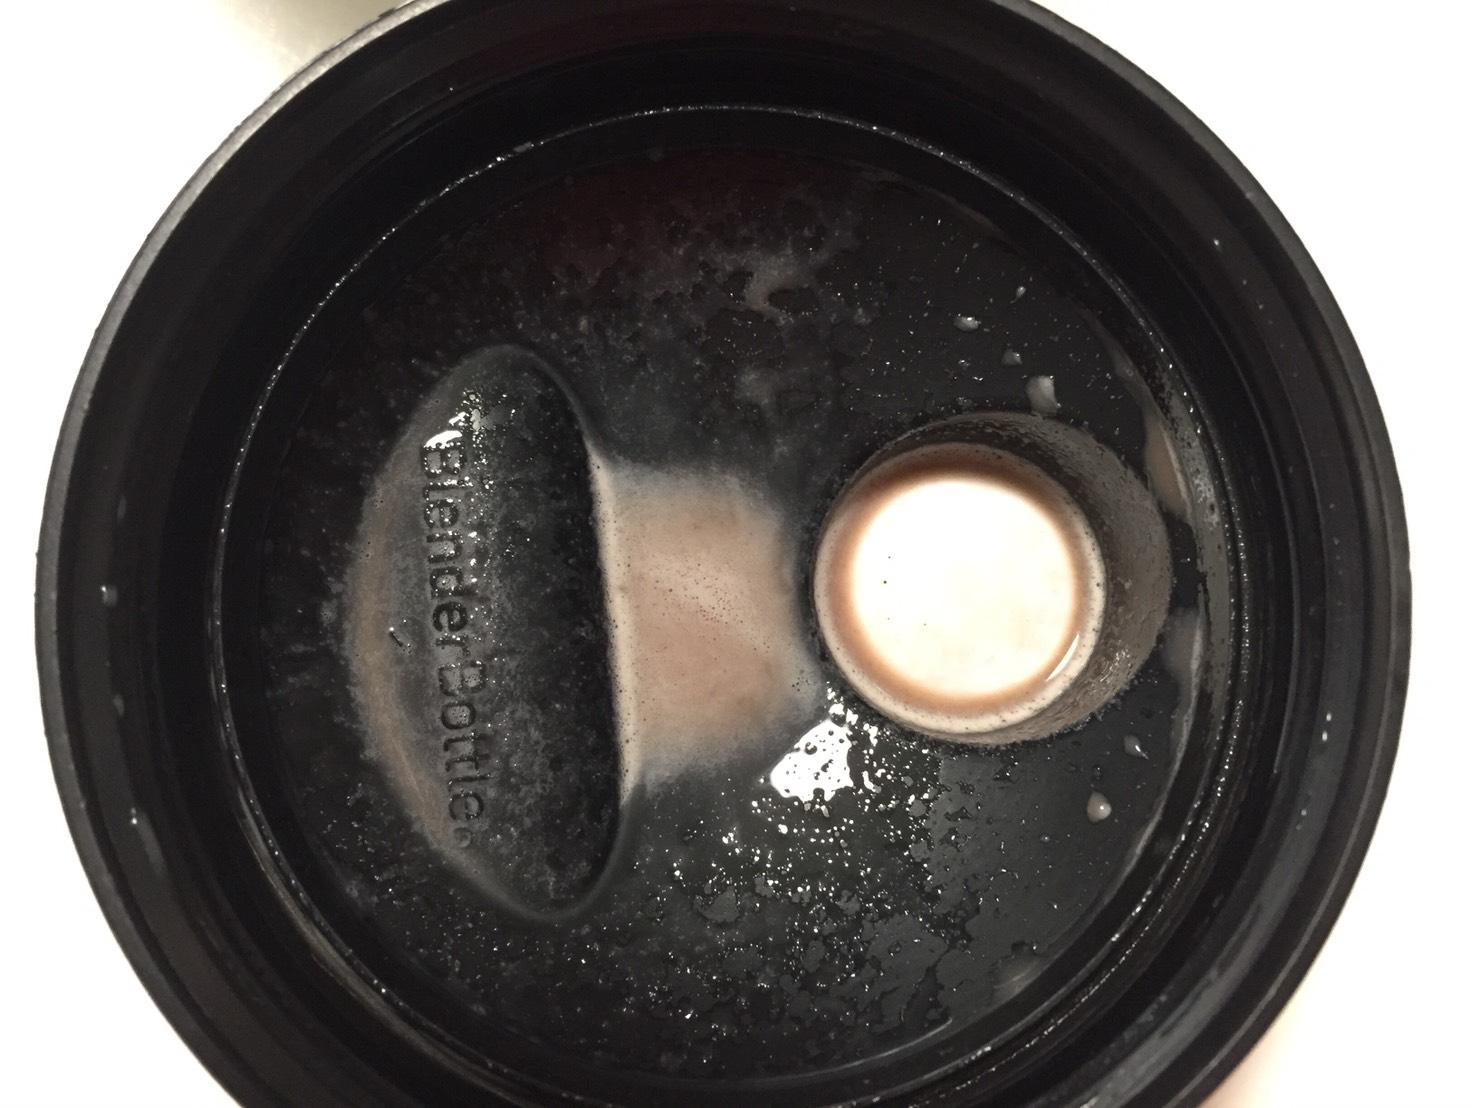 Chocolate Stevia Flavour(チョコレートステビア味)の蓋側